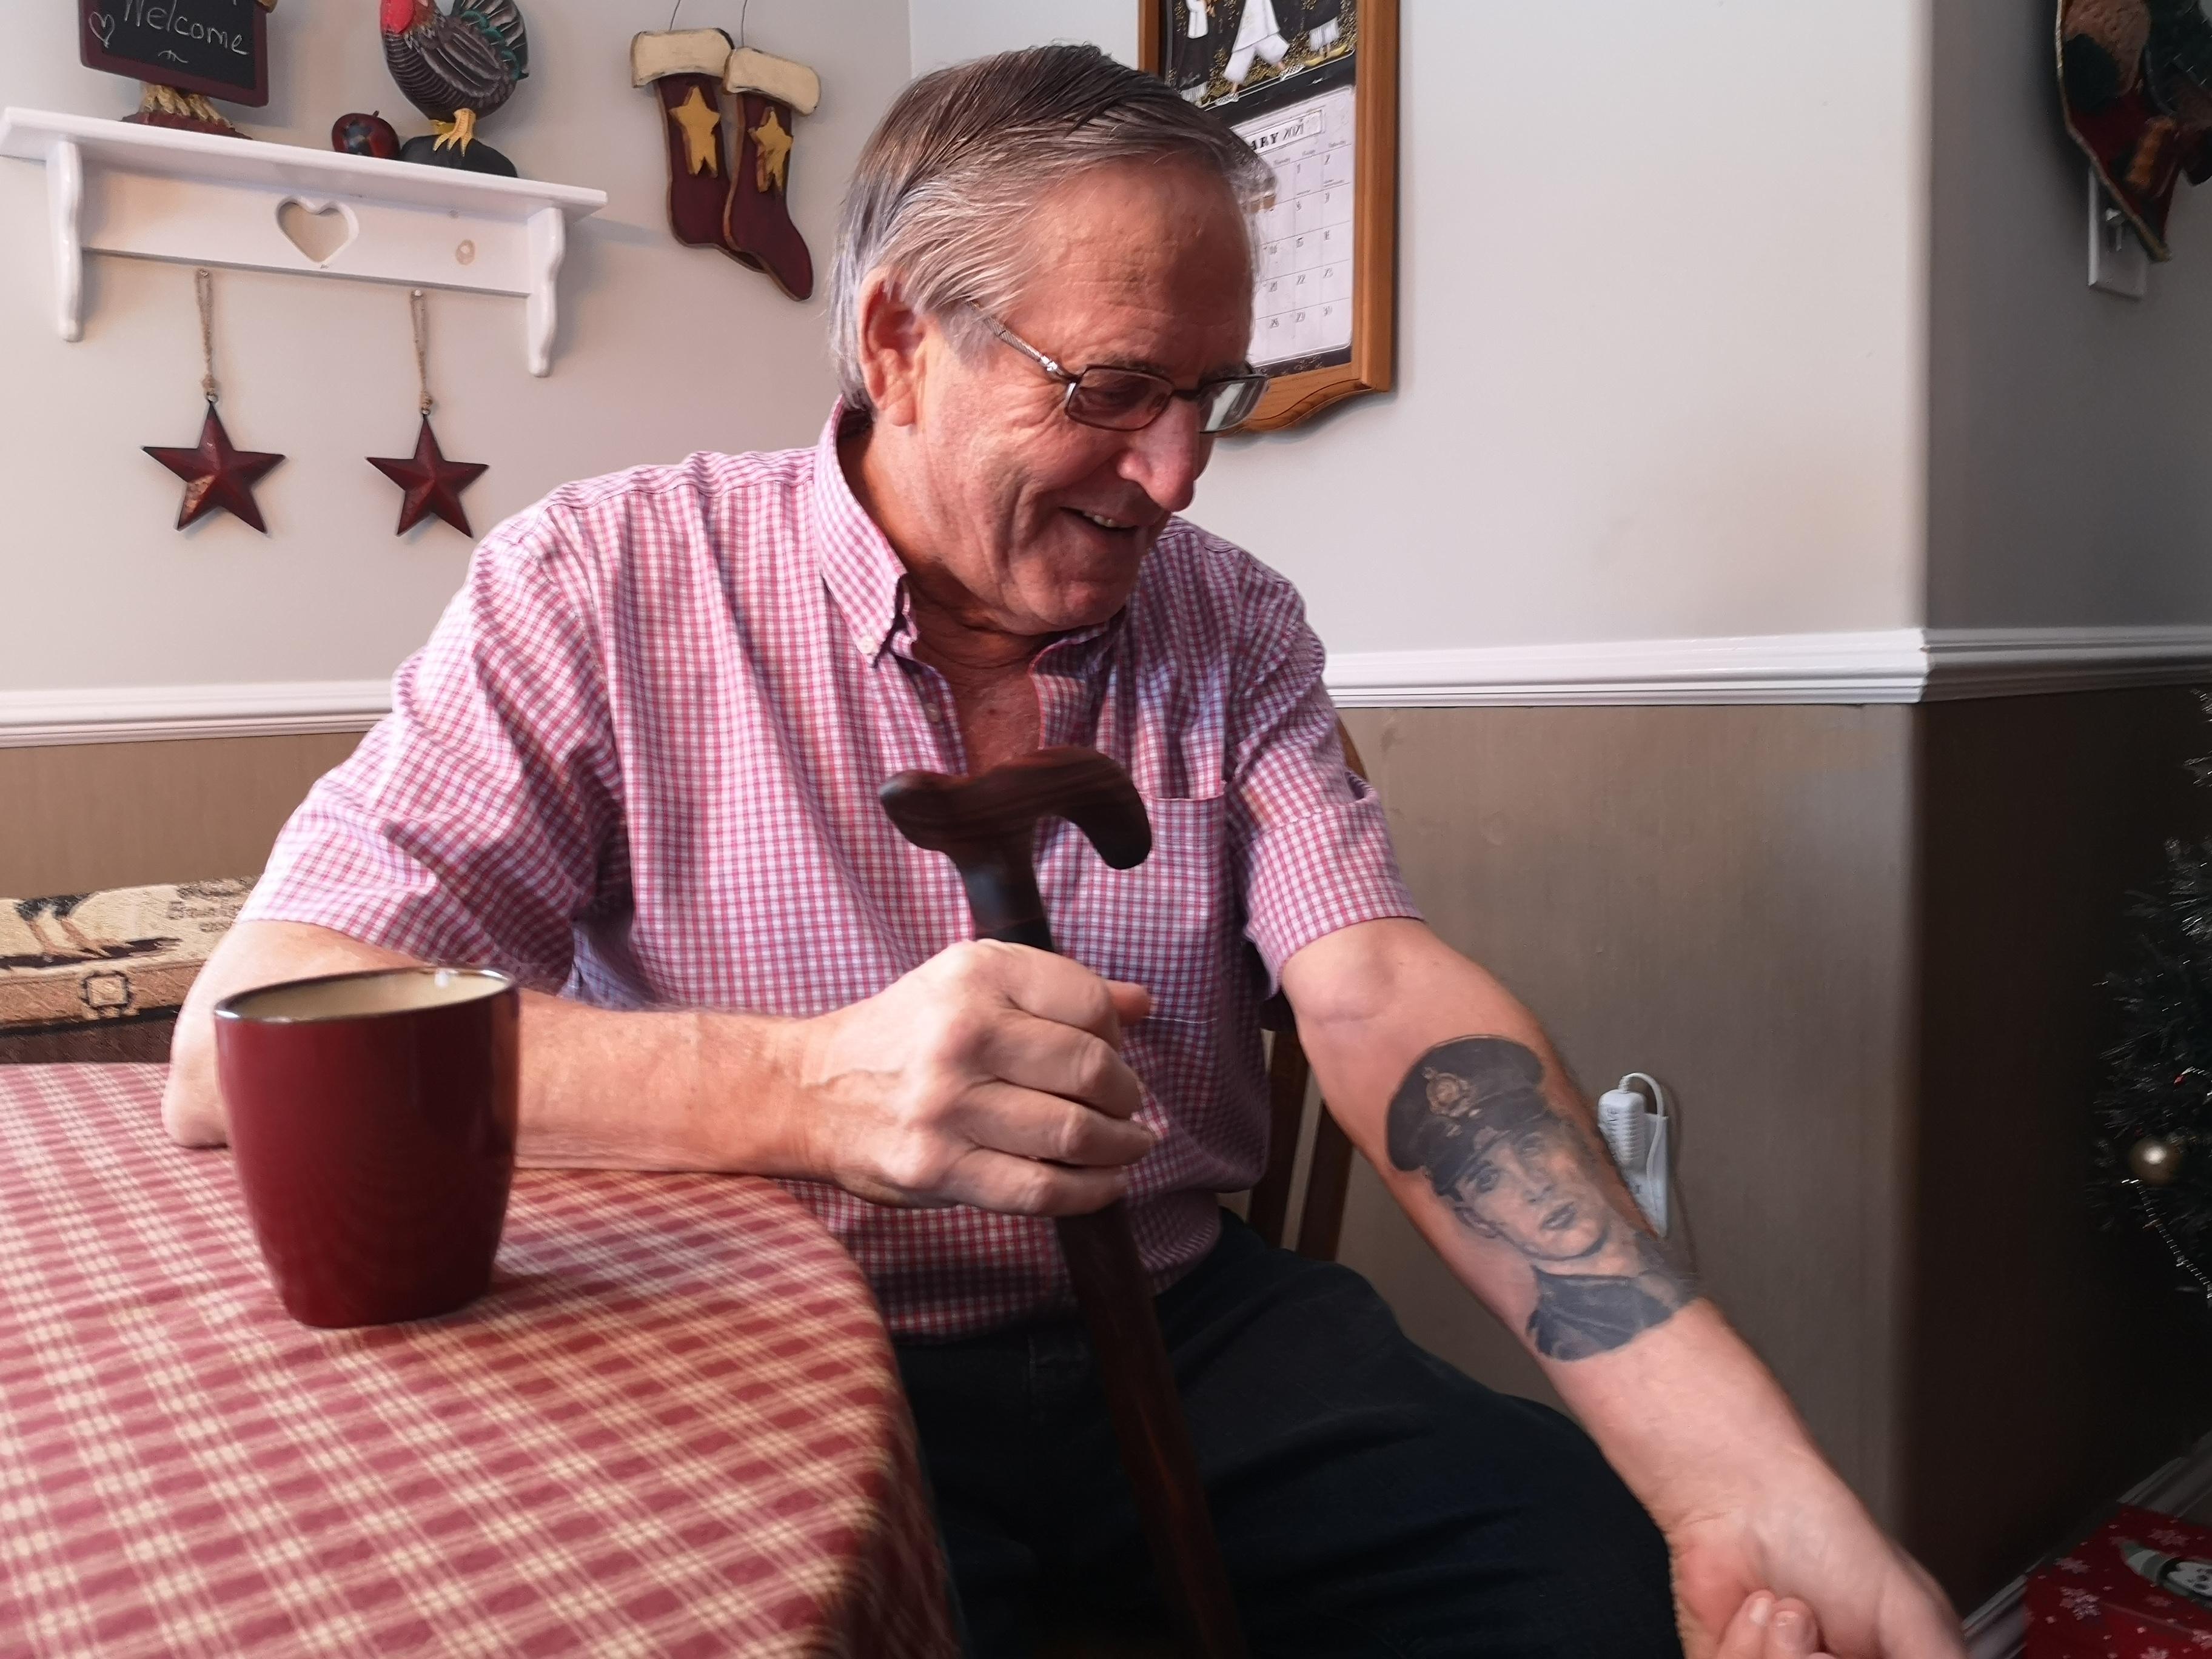 Robert Miller displays a tattoo of his son, Bruce. (Brian MacKay/CBC)